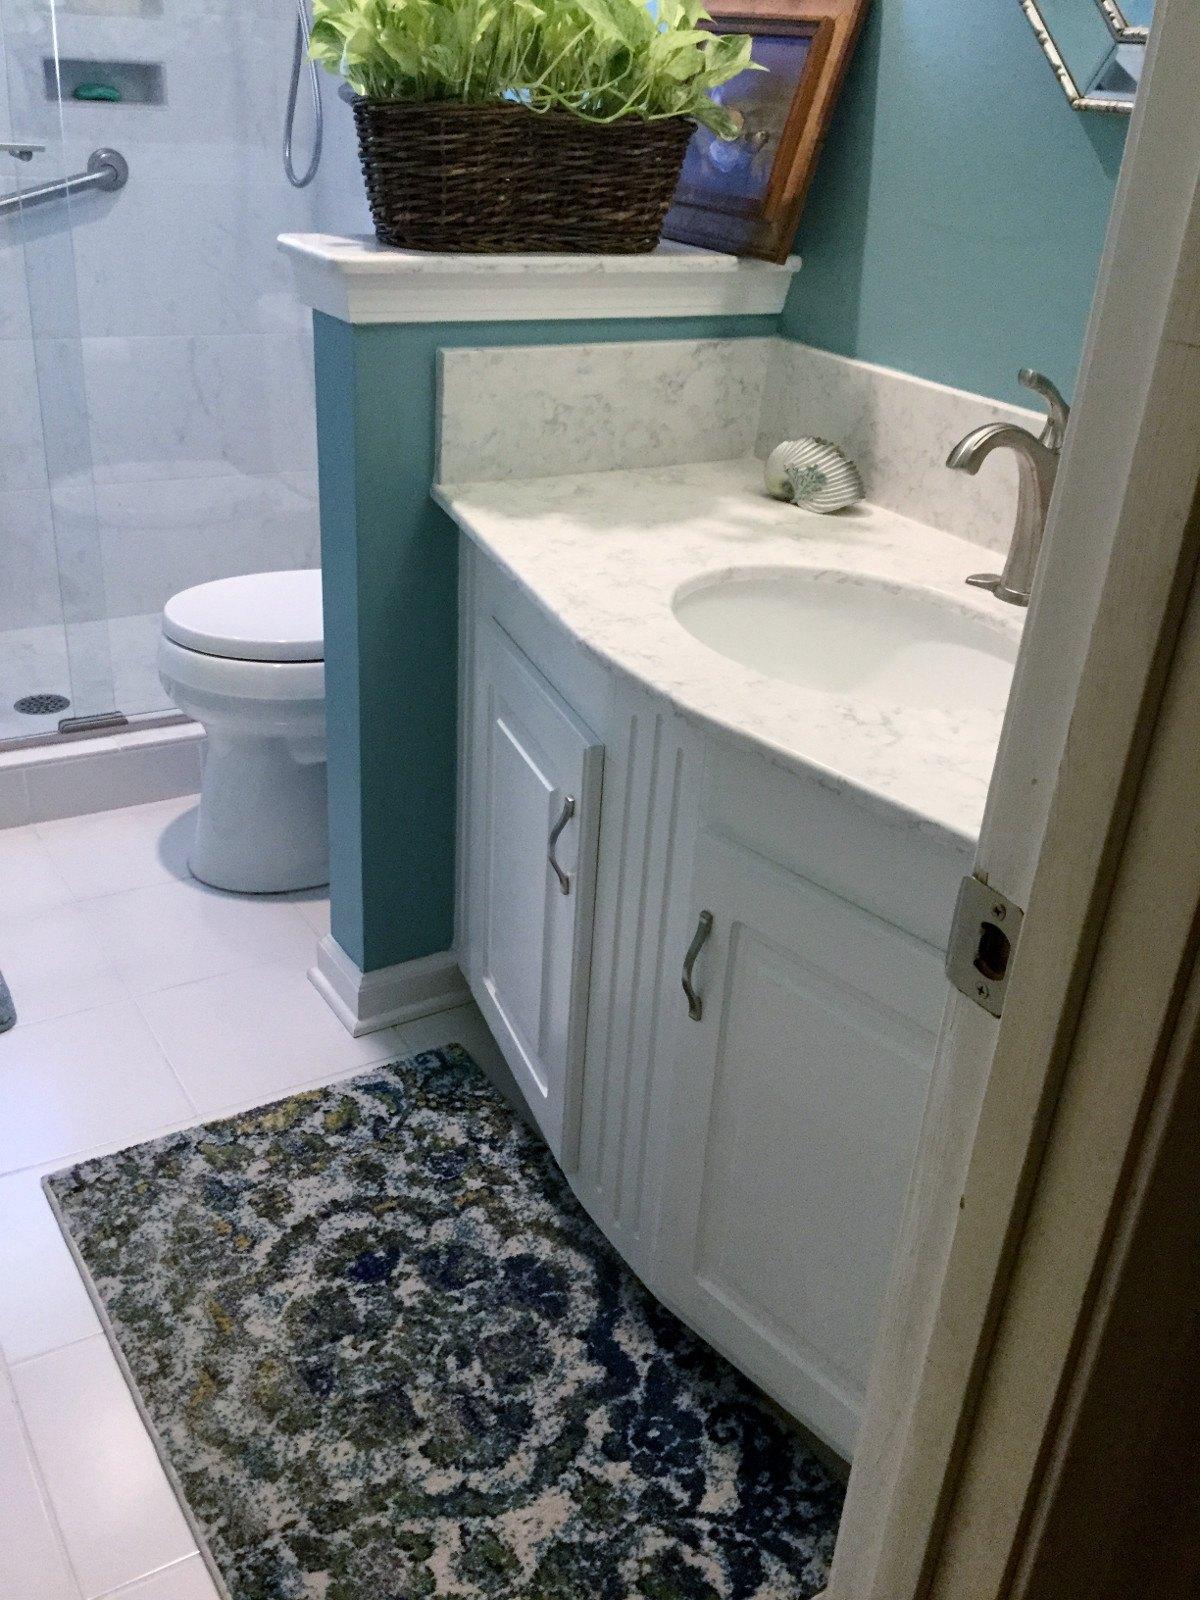 Upstairs Bathroom St Choice Home Improvements - Bathroom remodel fort walton beach fl